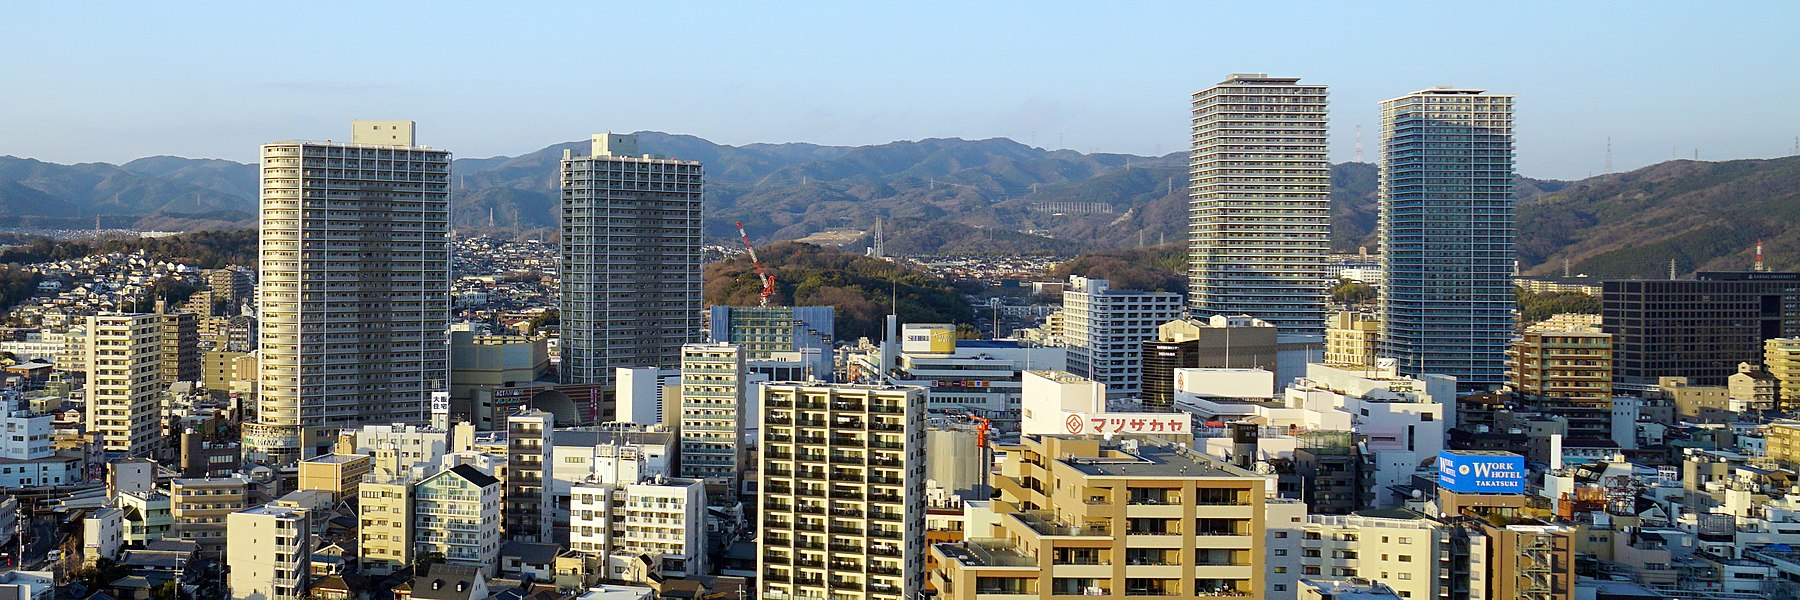 150124 Takatsuki city Osaka pref Japan01s5t.jpg